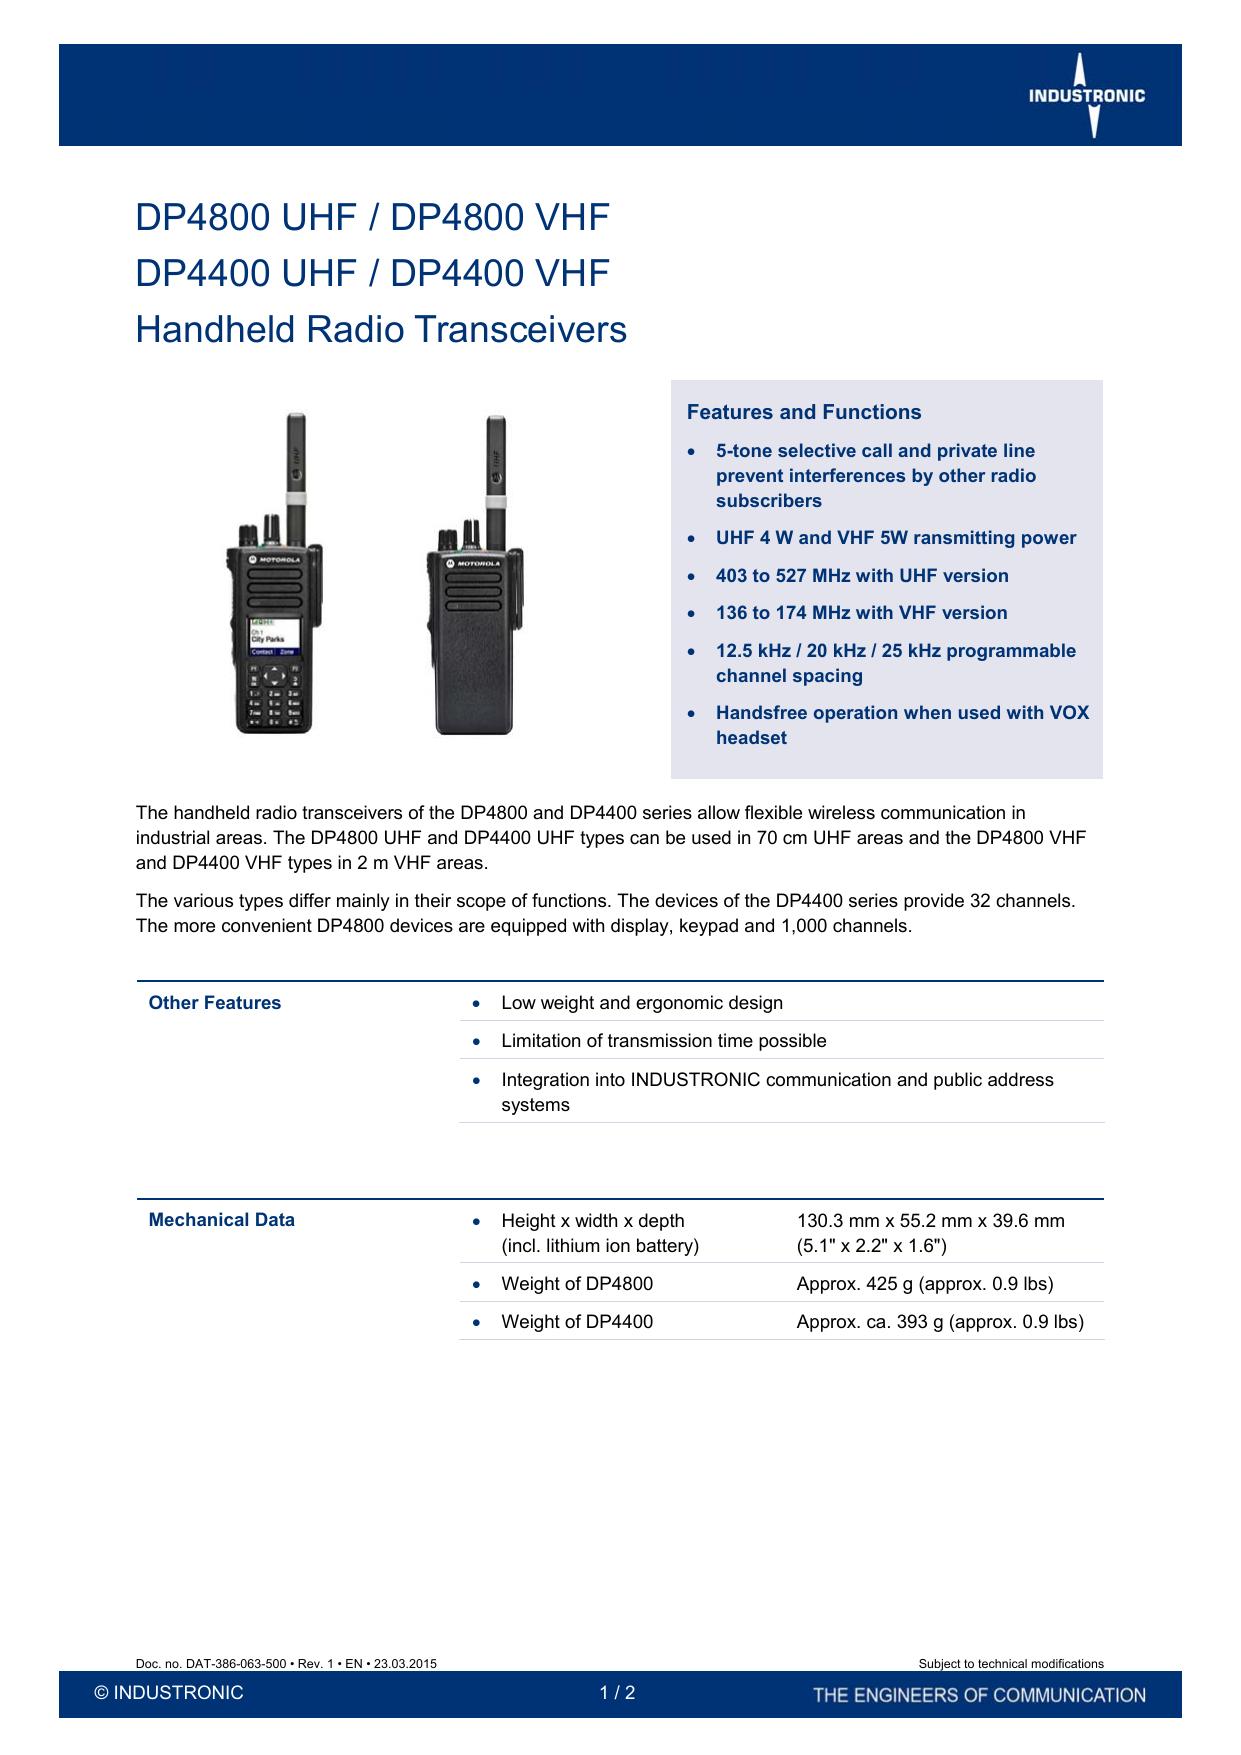 Handheld Radio Transceivers